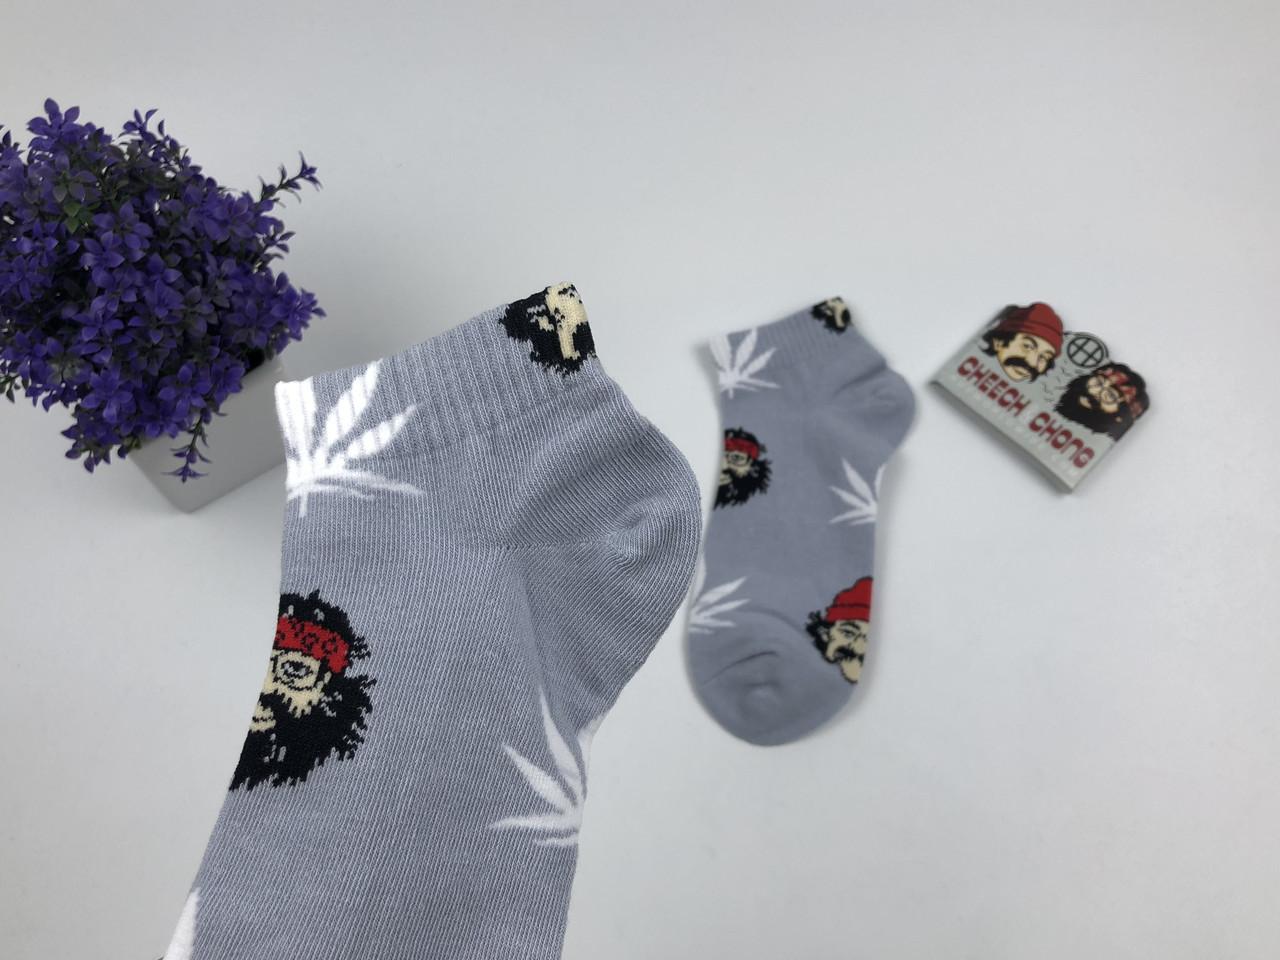 Носки HUF Cheech Chong низкие - серый белый лист